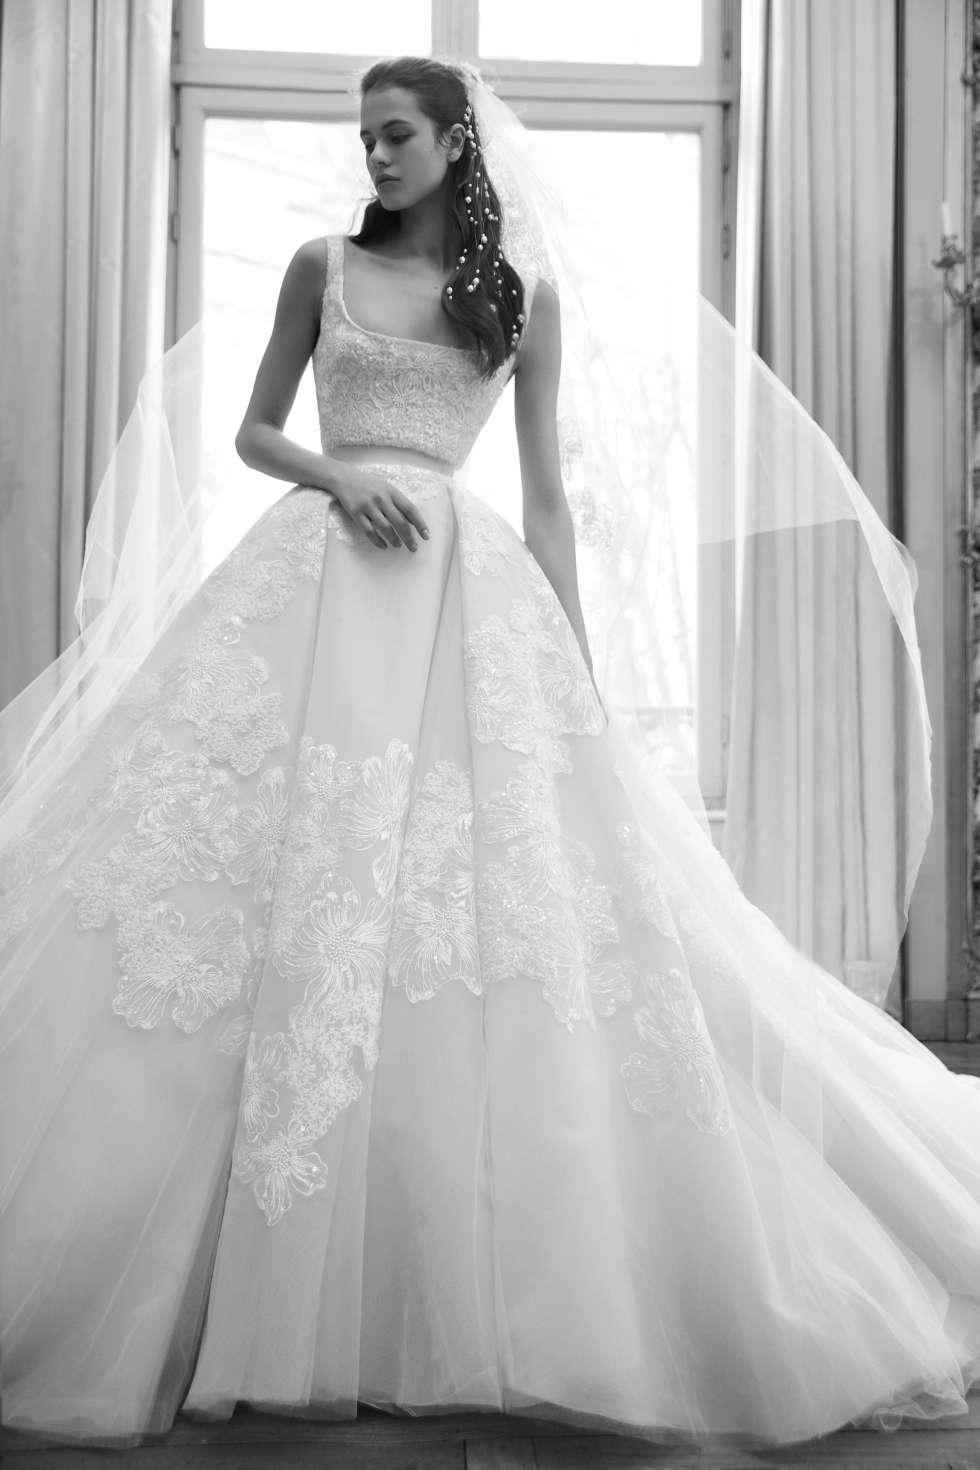 c7c128dae صور أجمل فساتين زفاف فخمة وأنيقة لعروس عام 2019 | موقع العروس